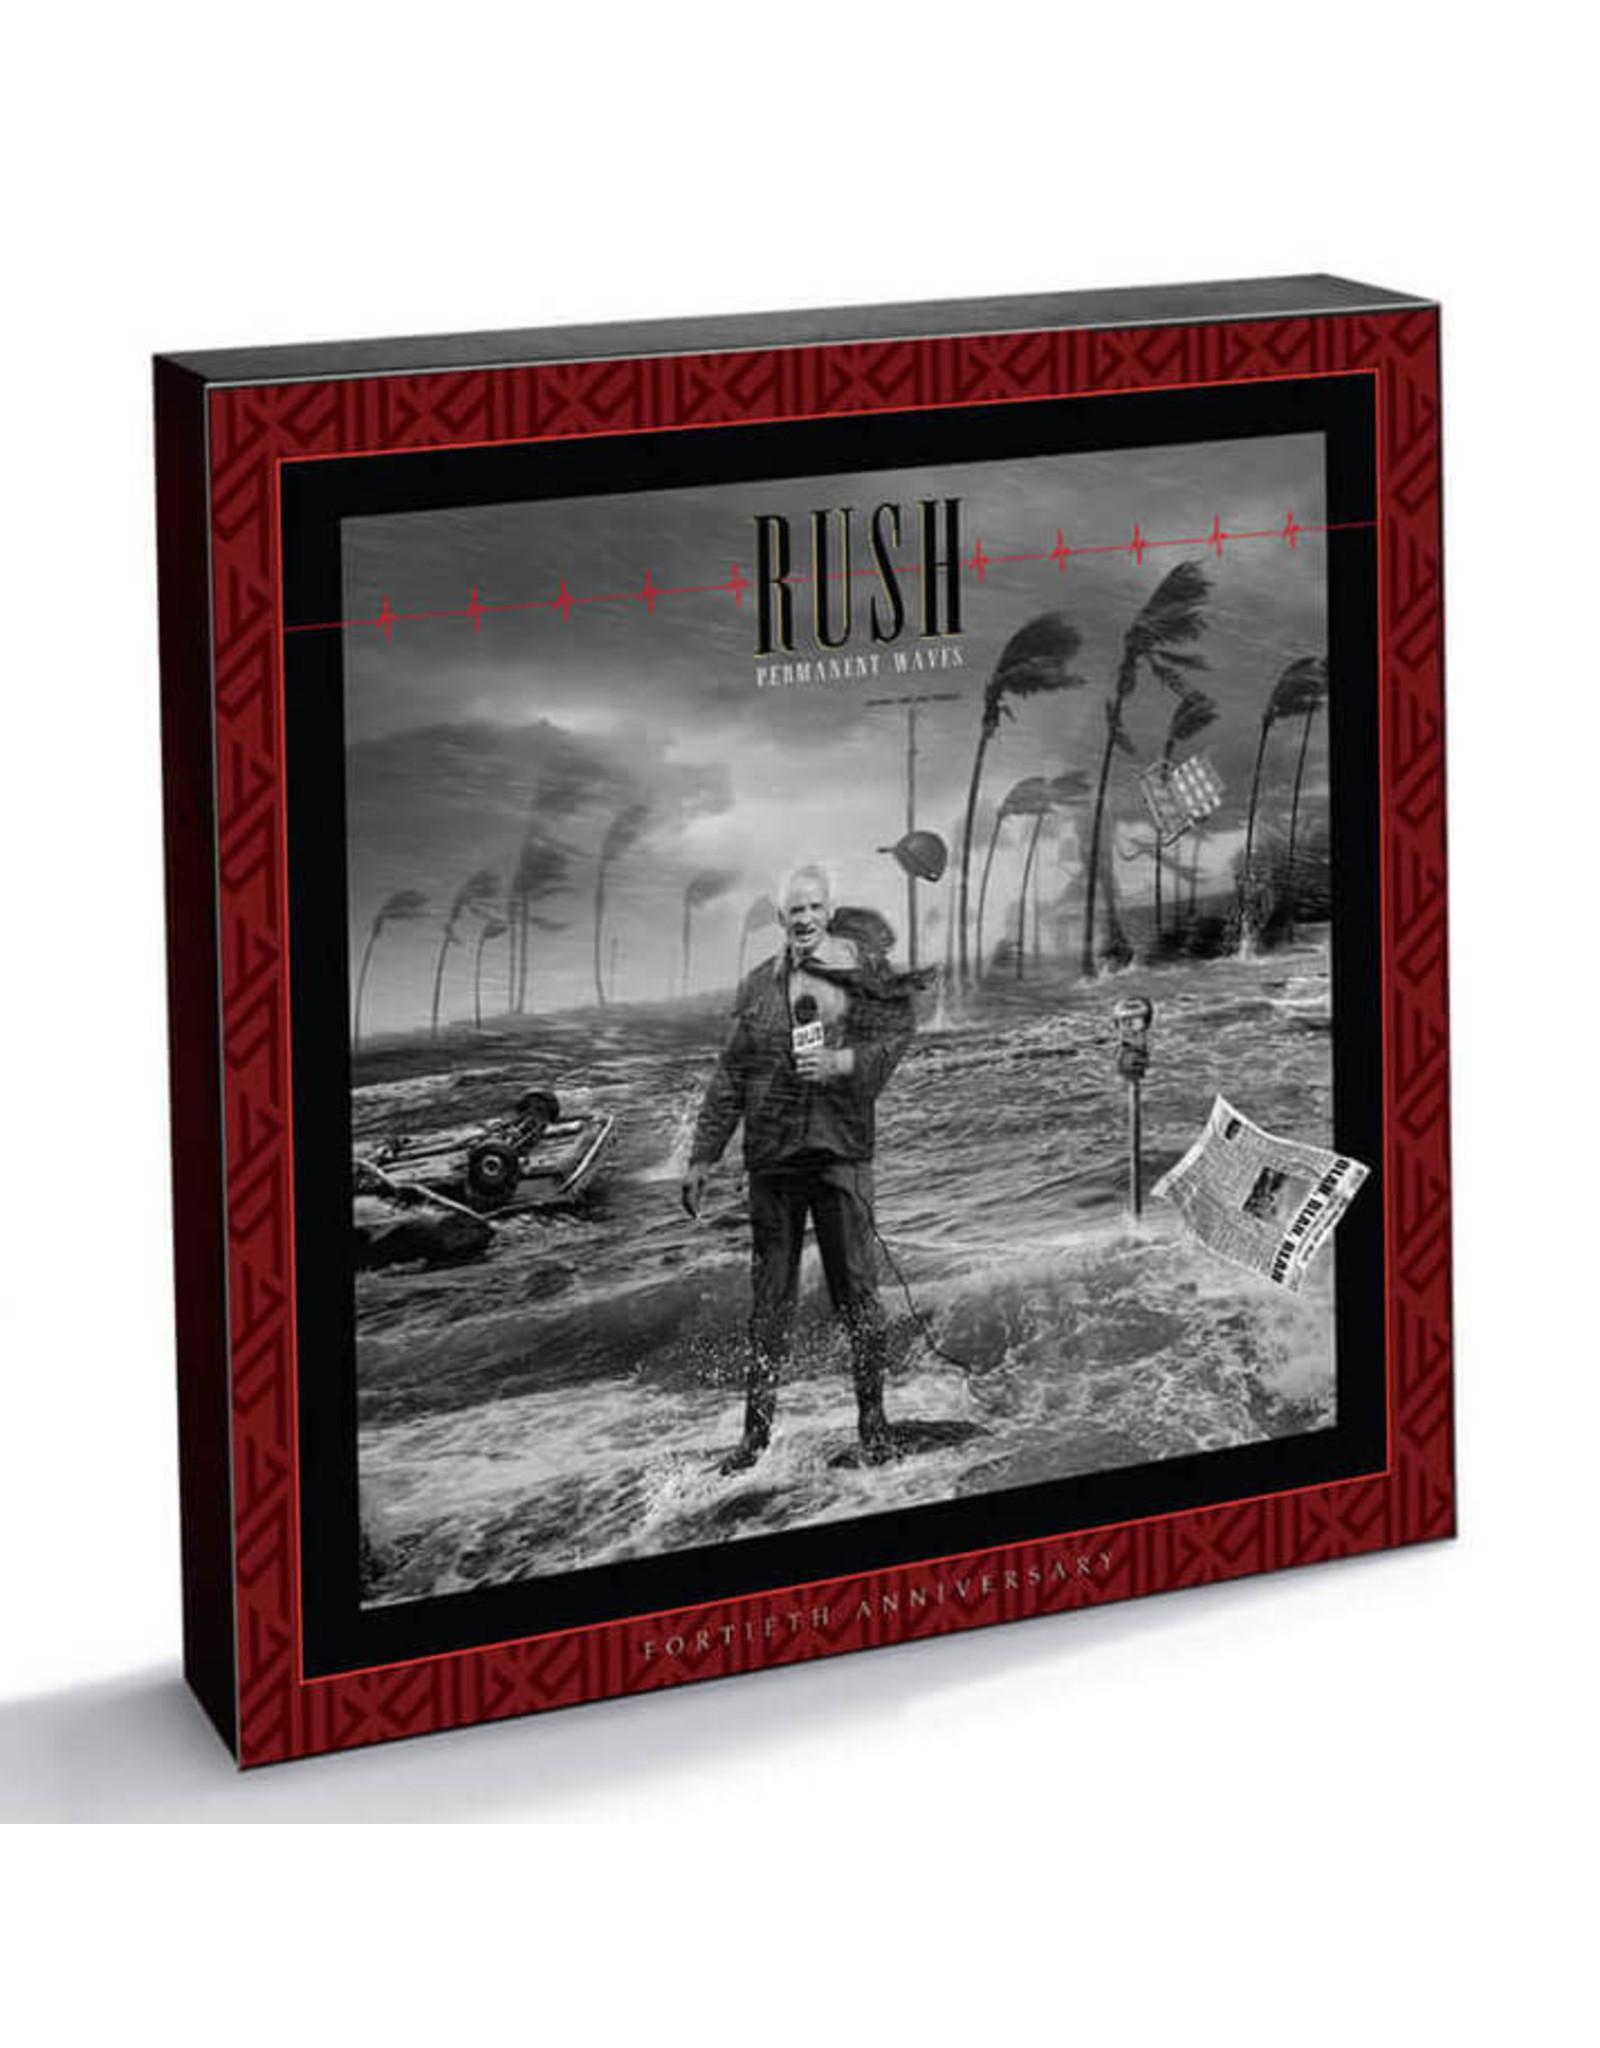 Rush - Permanent Waves (40th Anniversary 3LP Boxset) LP